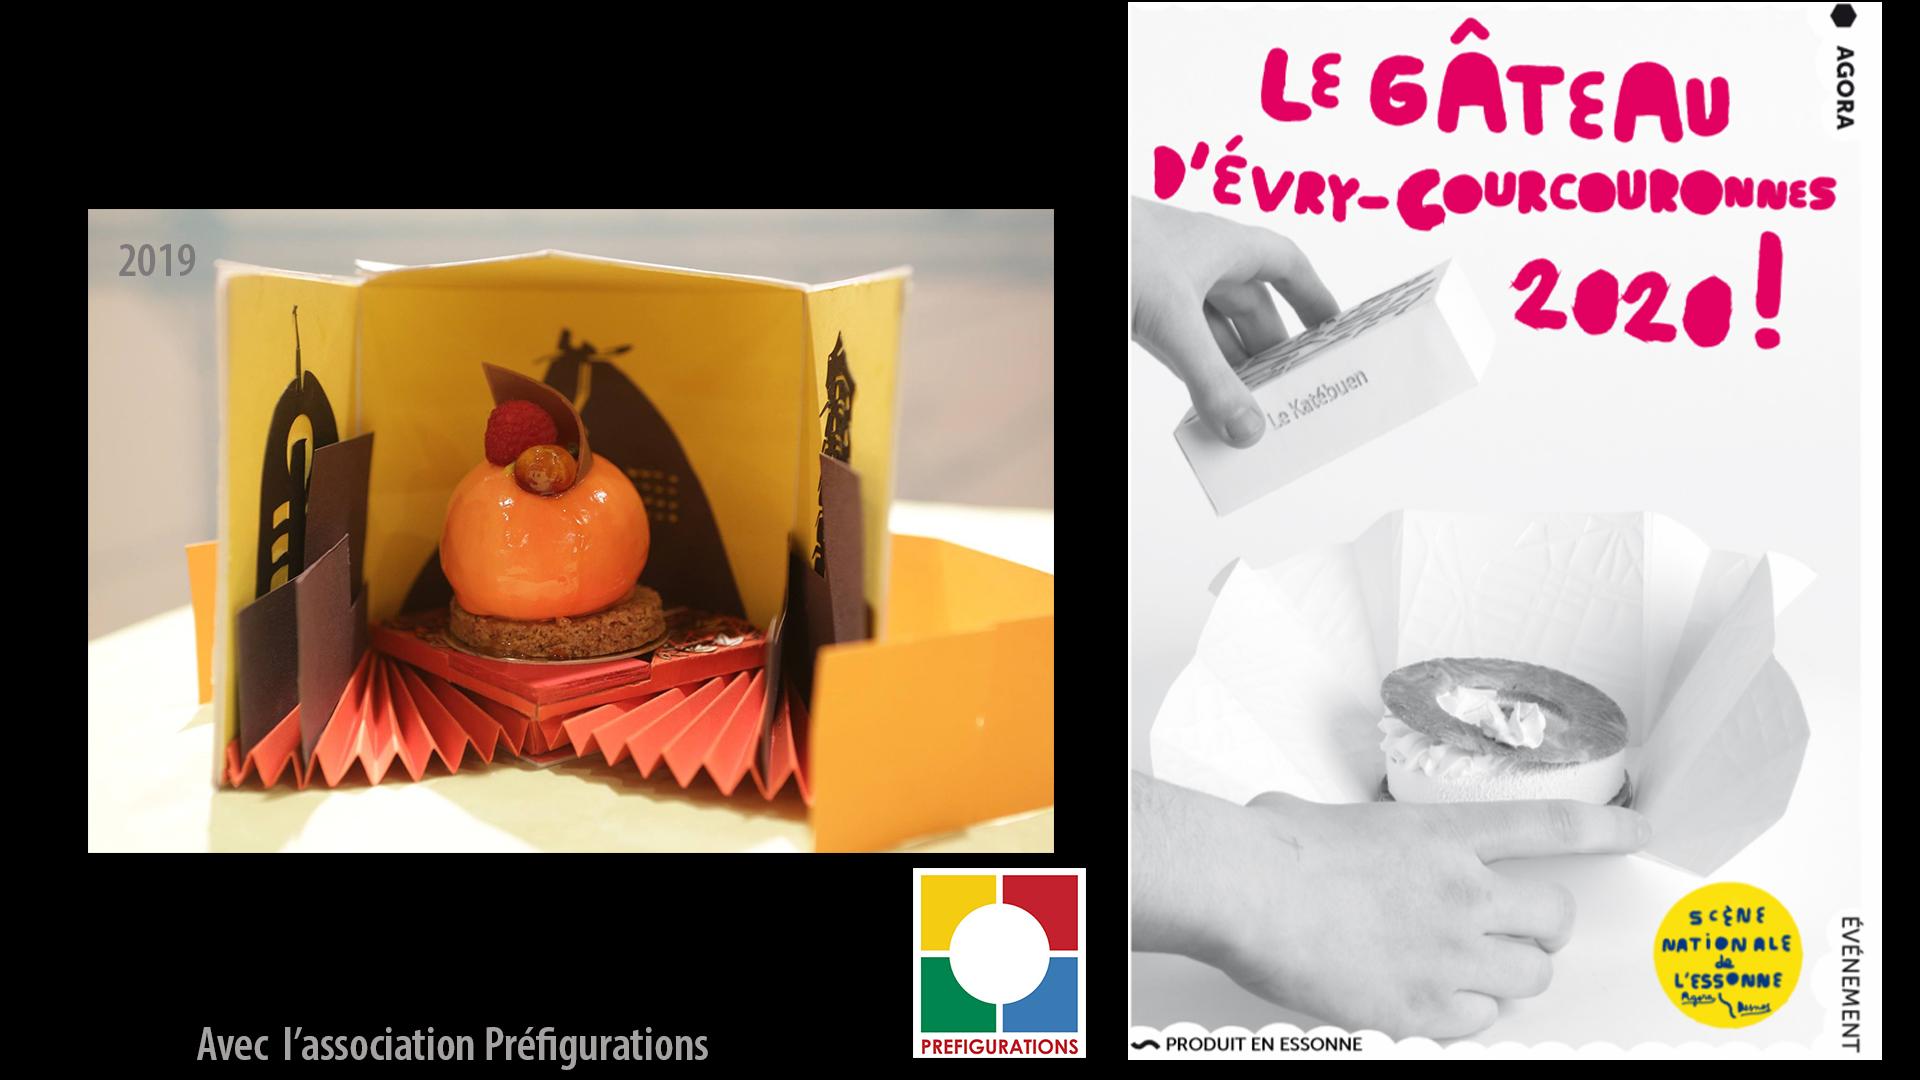 gateau-devry-3e ed-2020-v2